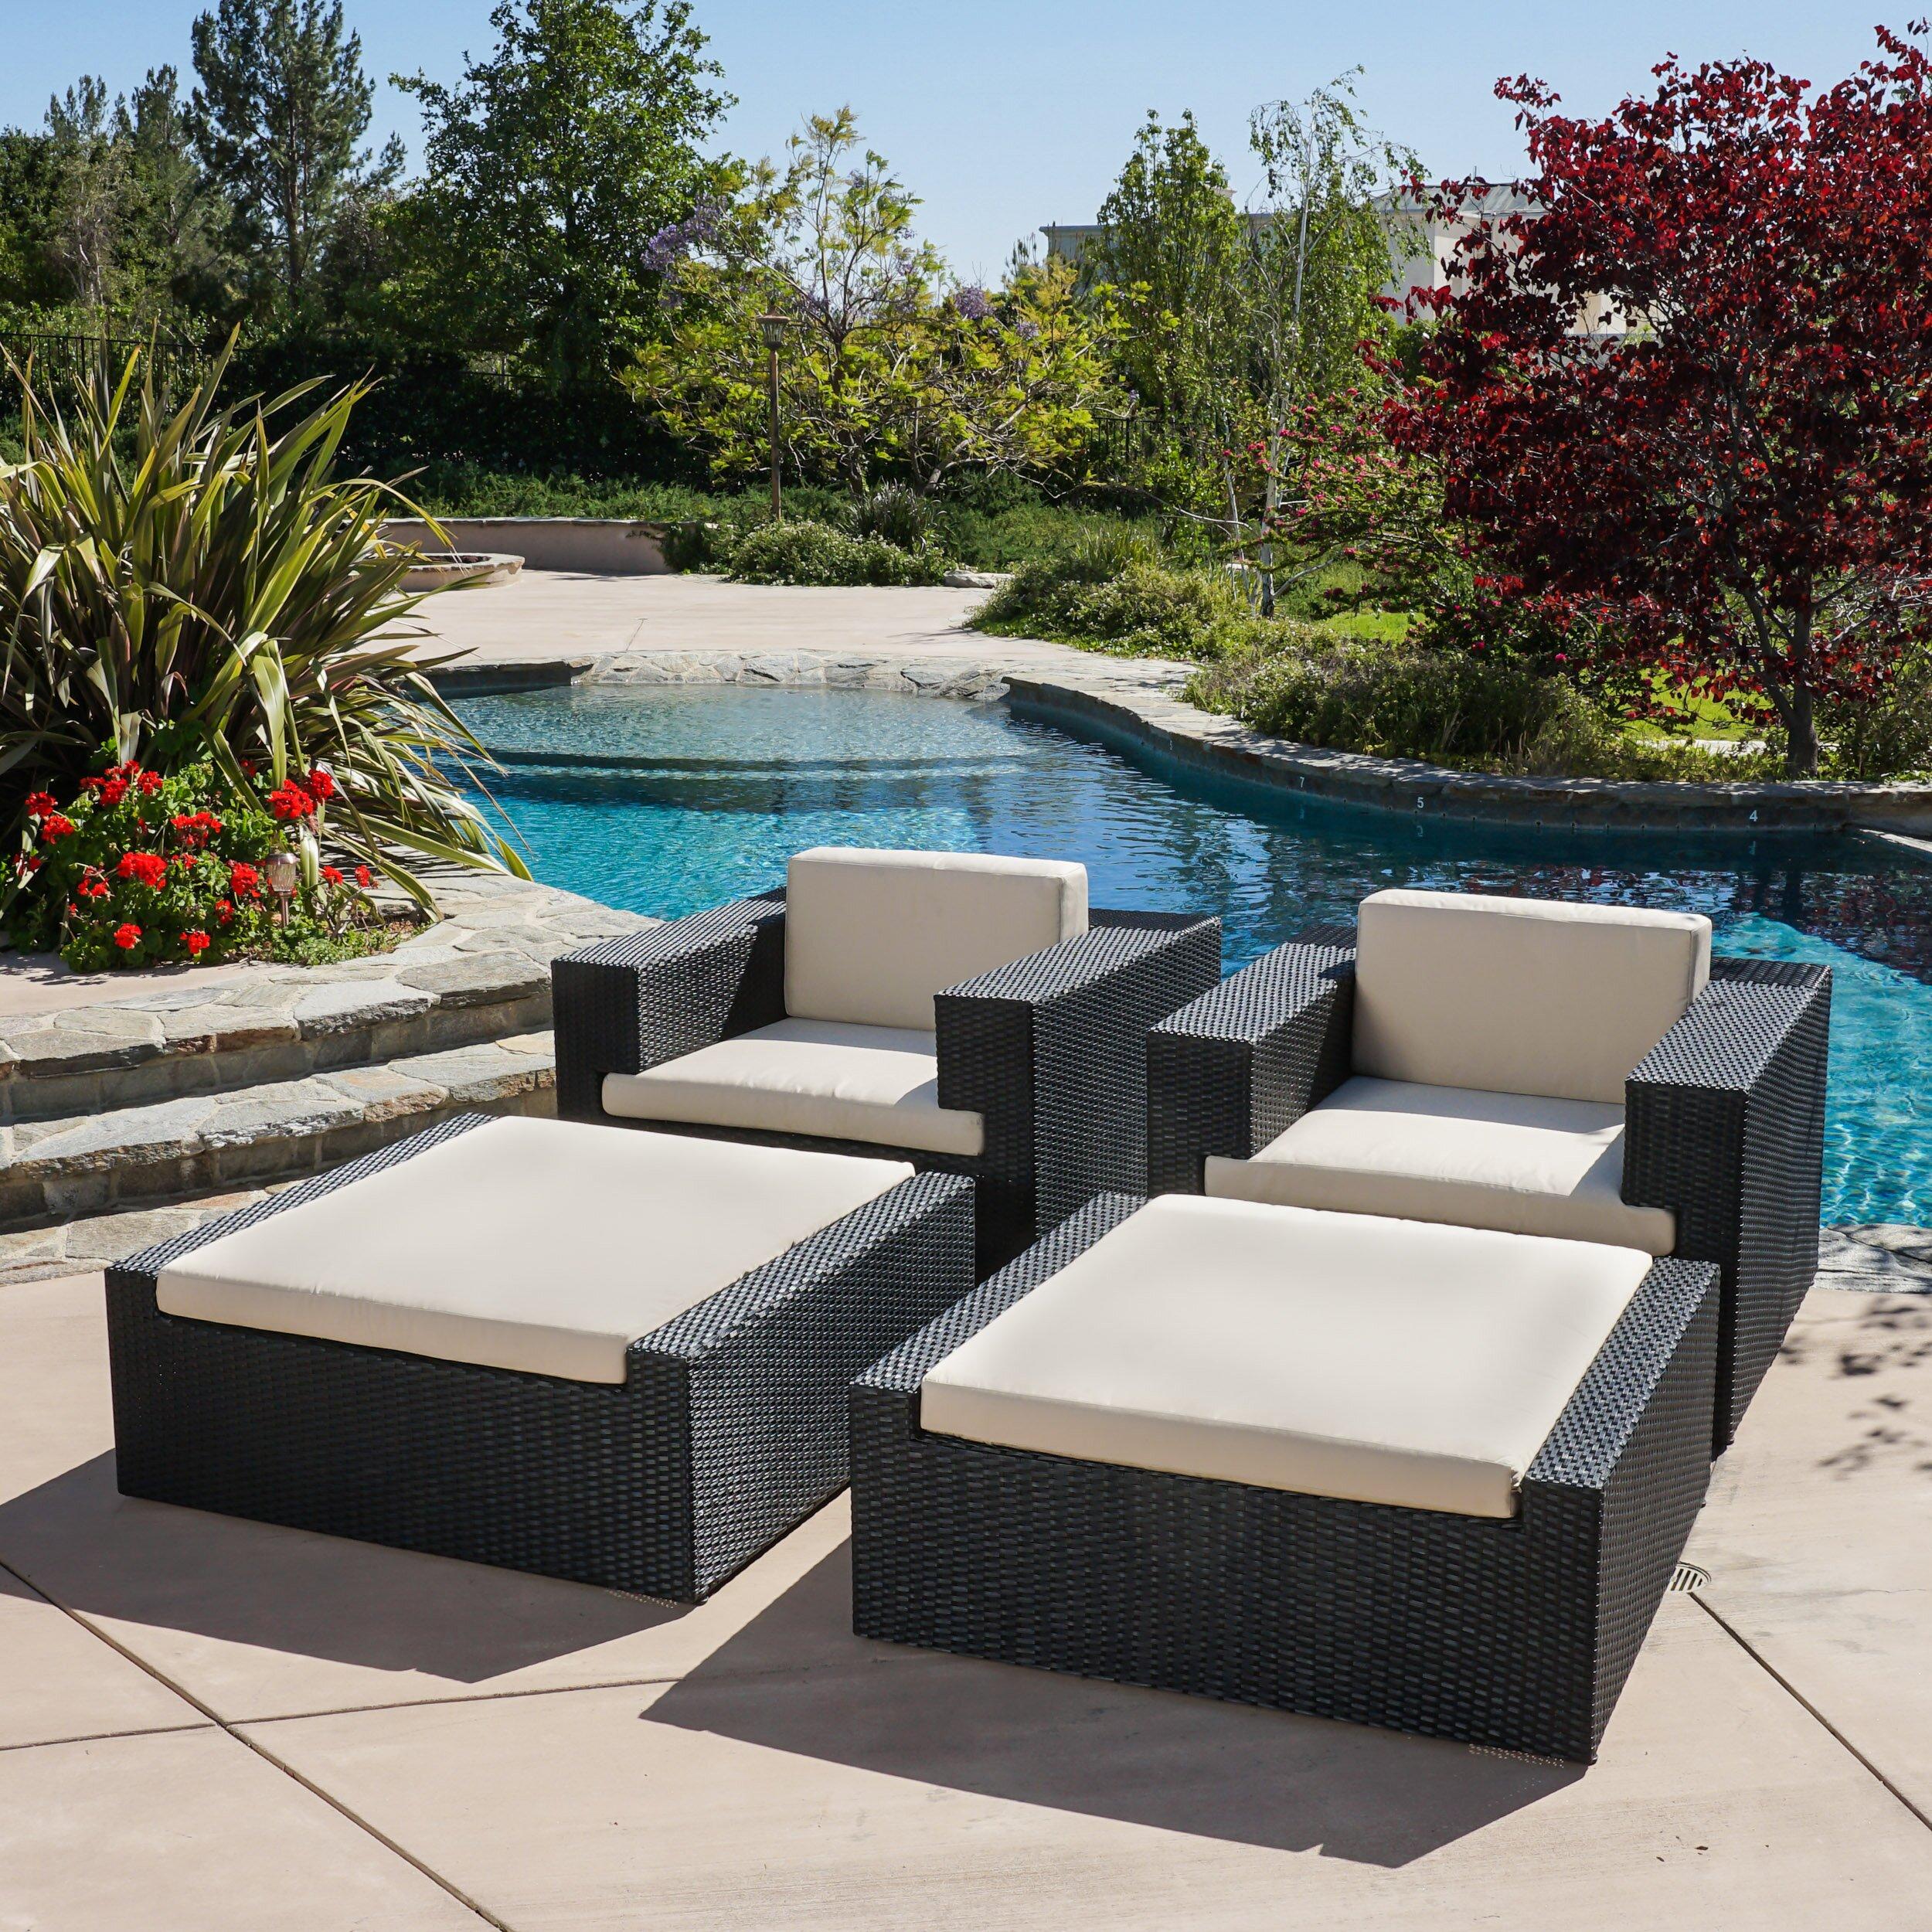 Home Loft Concepts Ventura 4 Piece Lounge Chair Set With